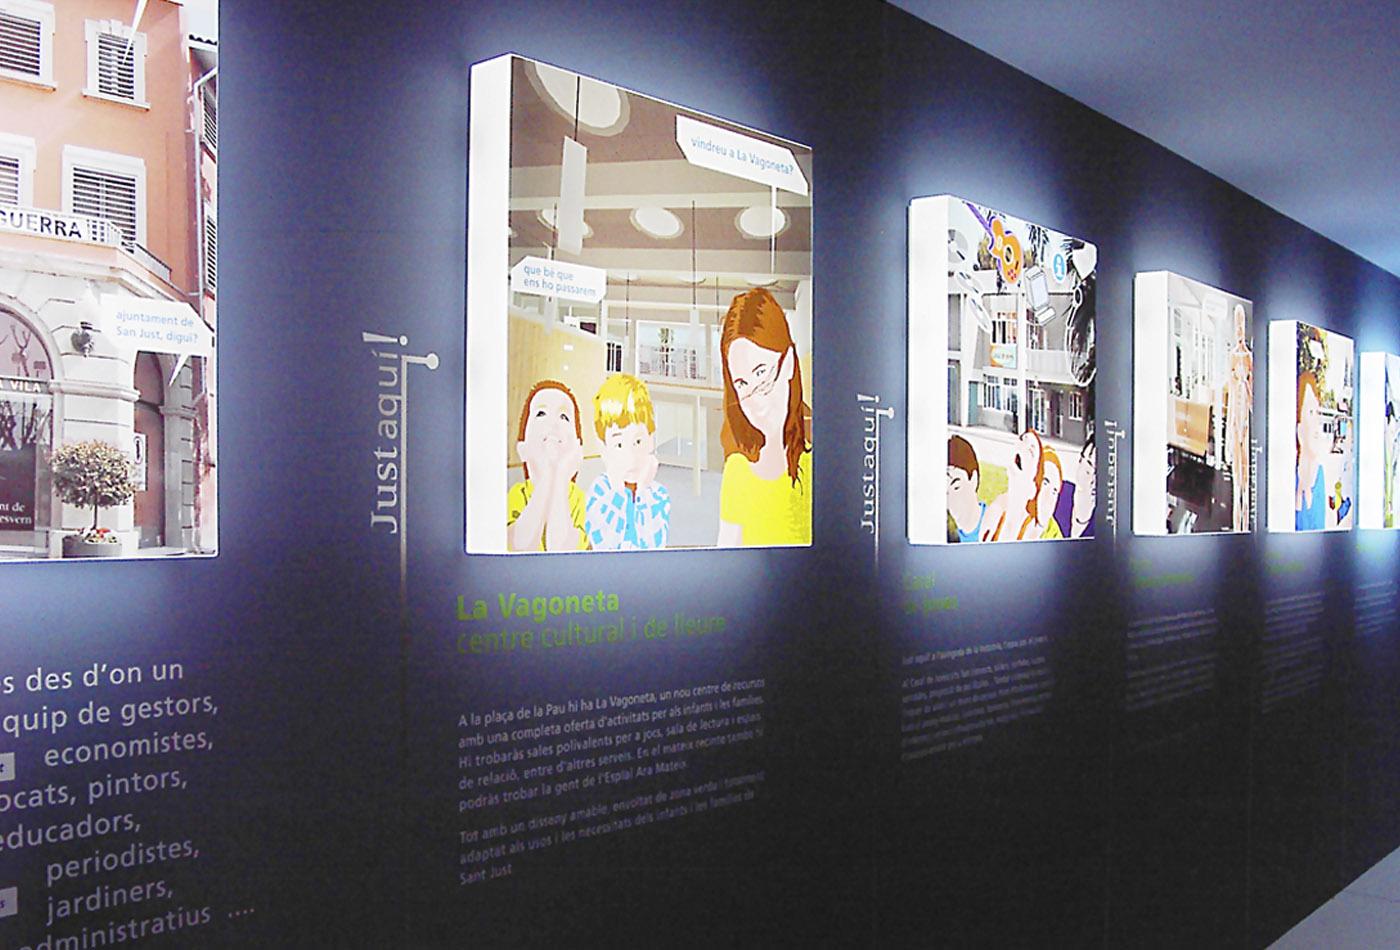 Sant-Just-esvern-stand-ajuntament-creartiva-exposició-barcelona-disseny-grafic-creartiva